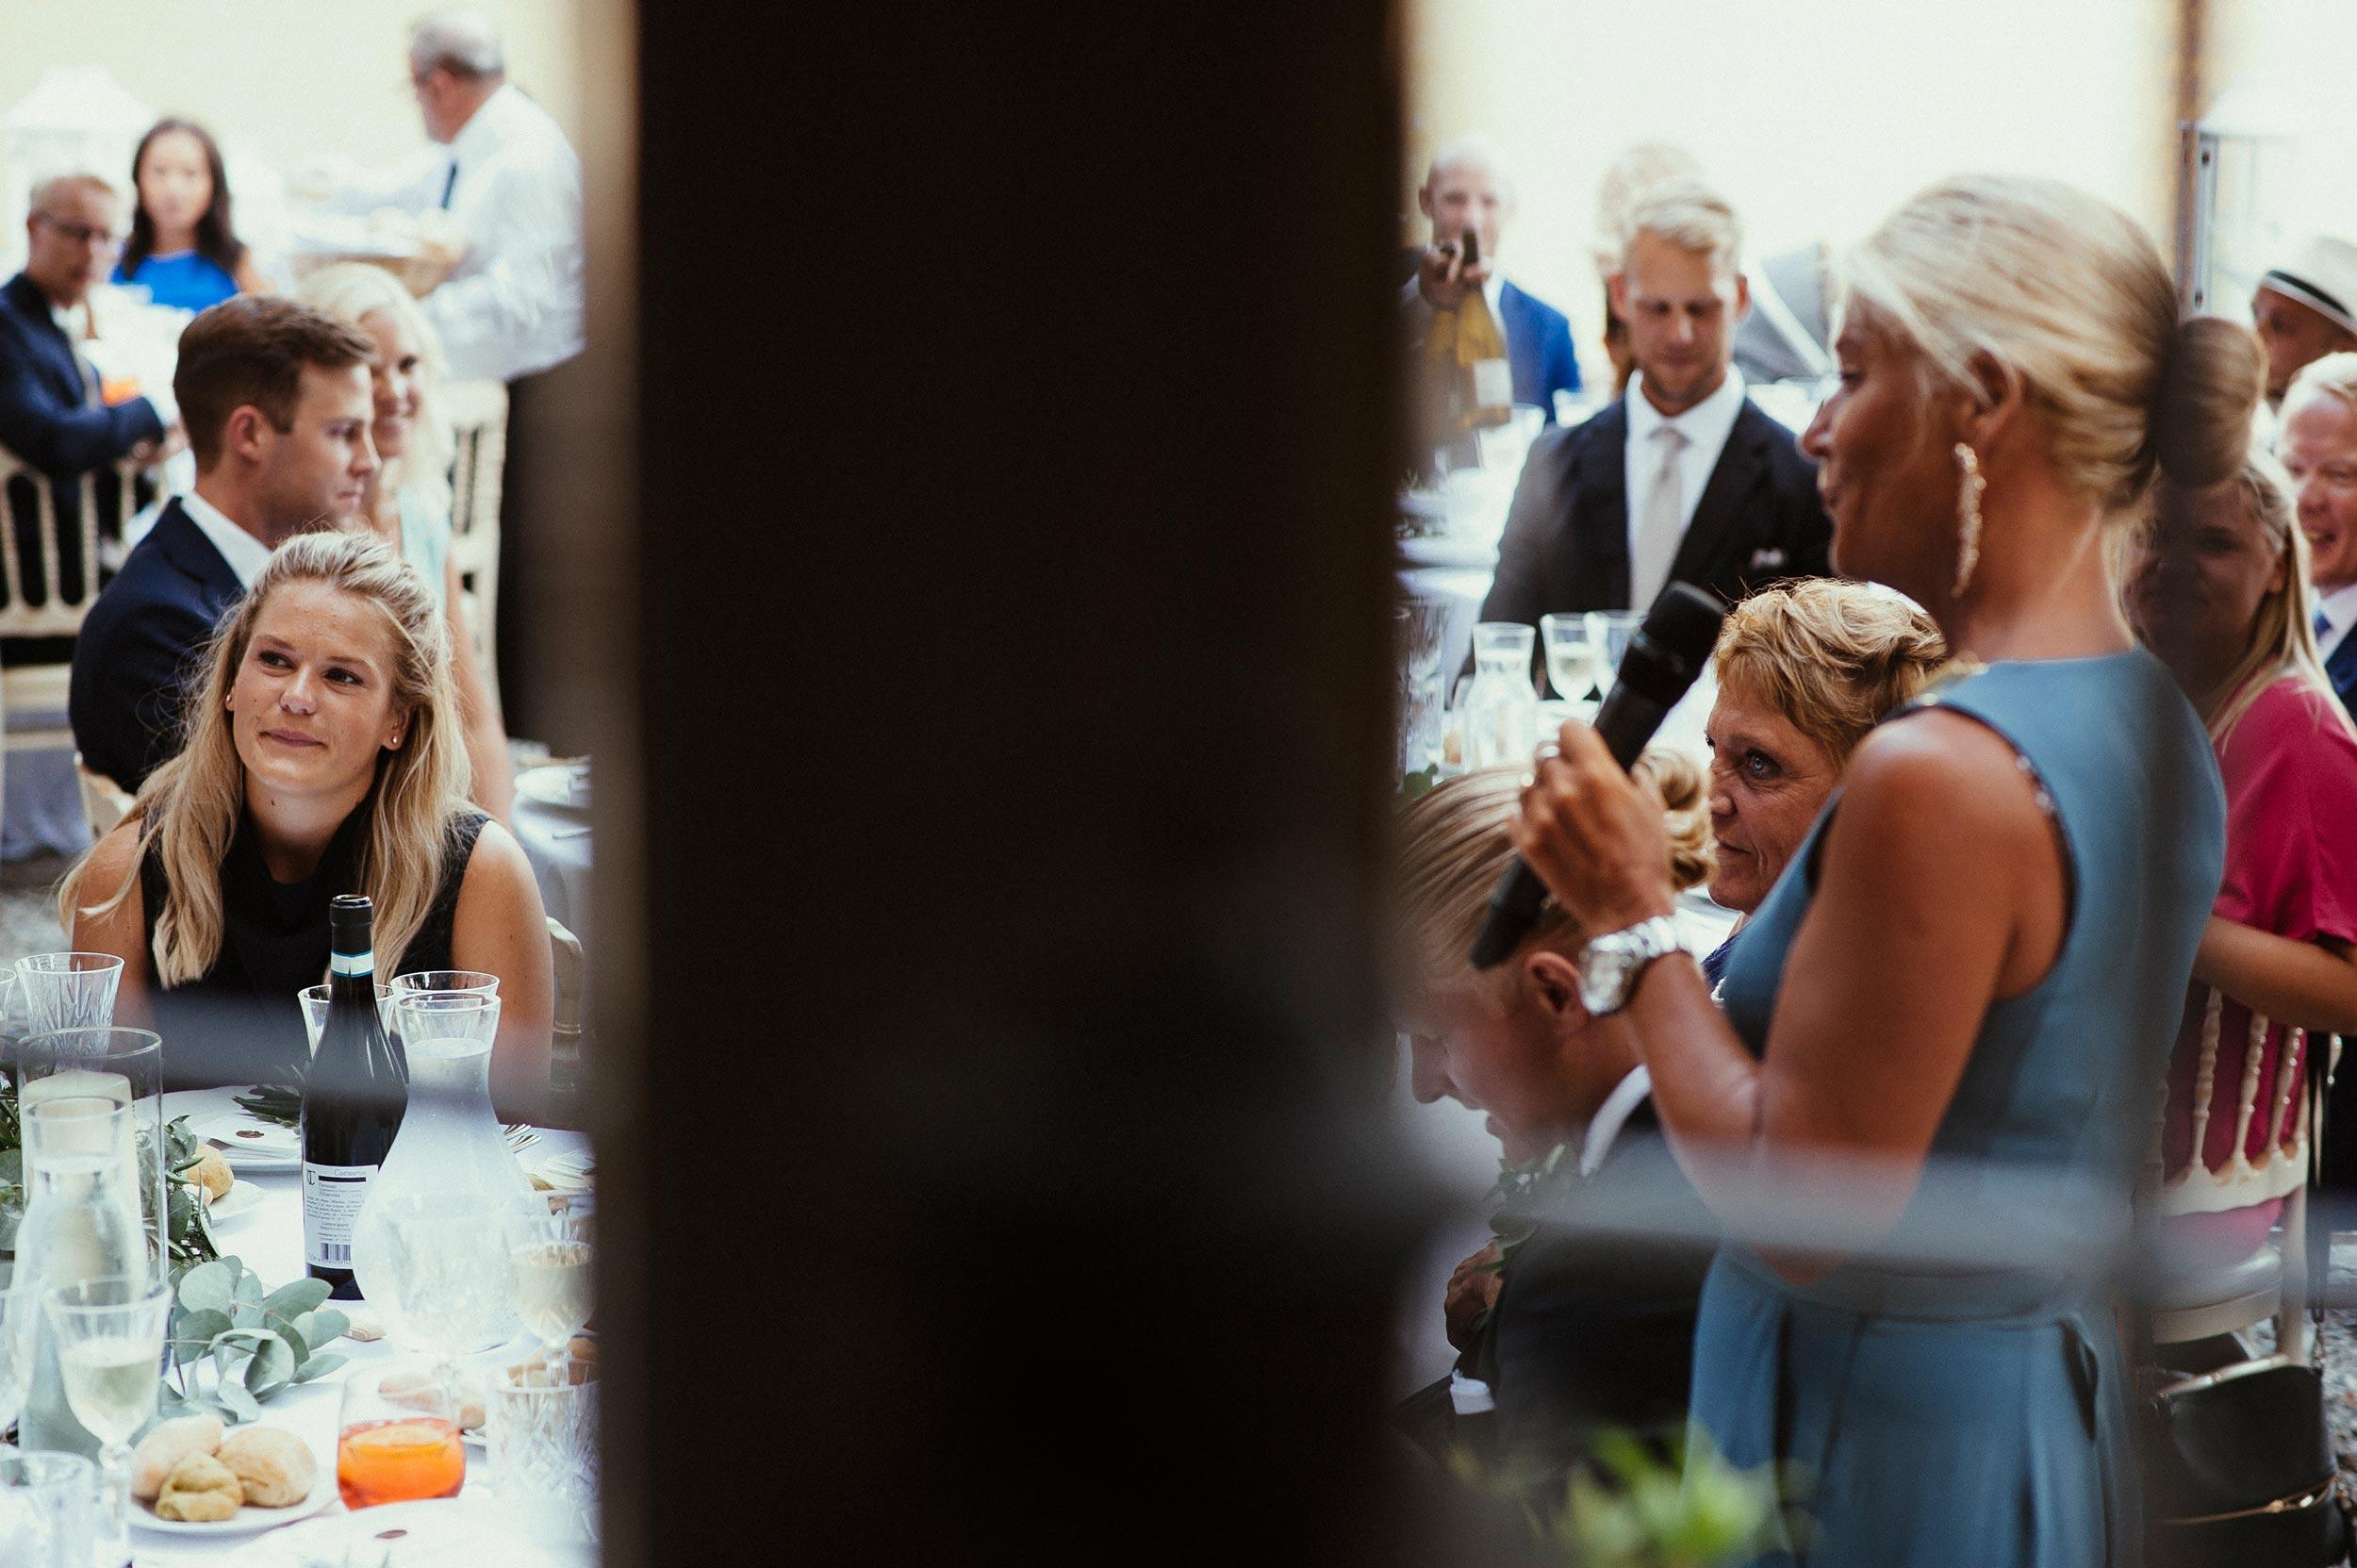 2018-Villa-Regina-Teodolinda-Lake-Como-Wedding-Photographer-Italy-Alessandro-Avenali-243.jpg